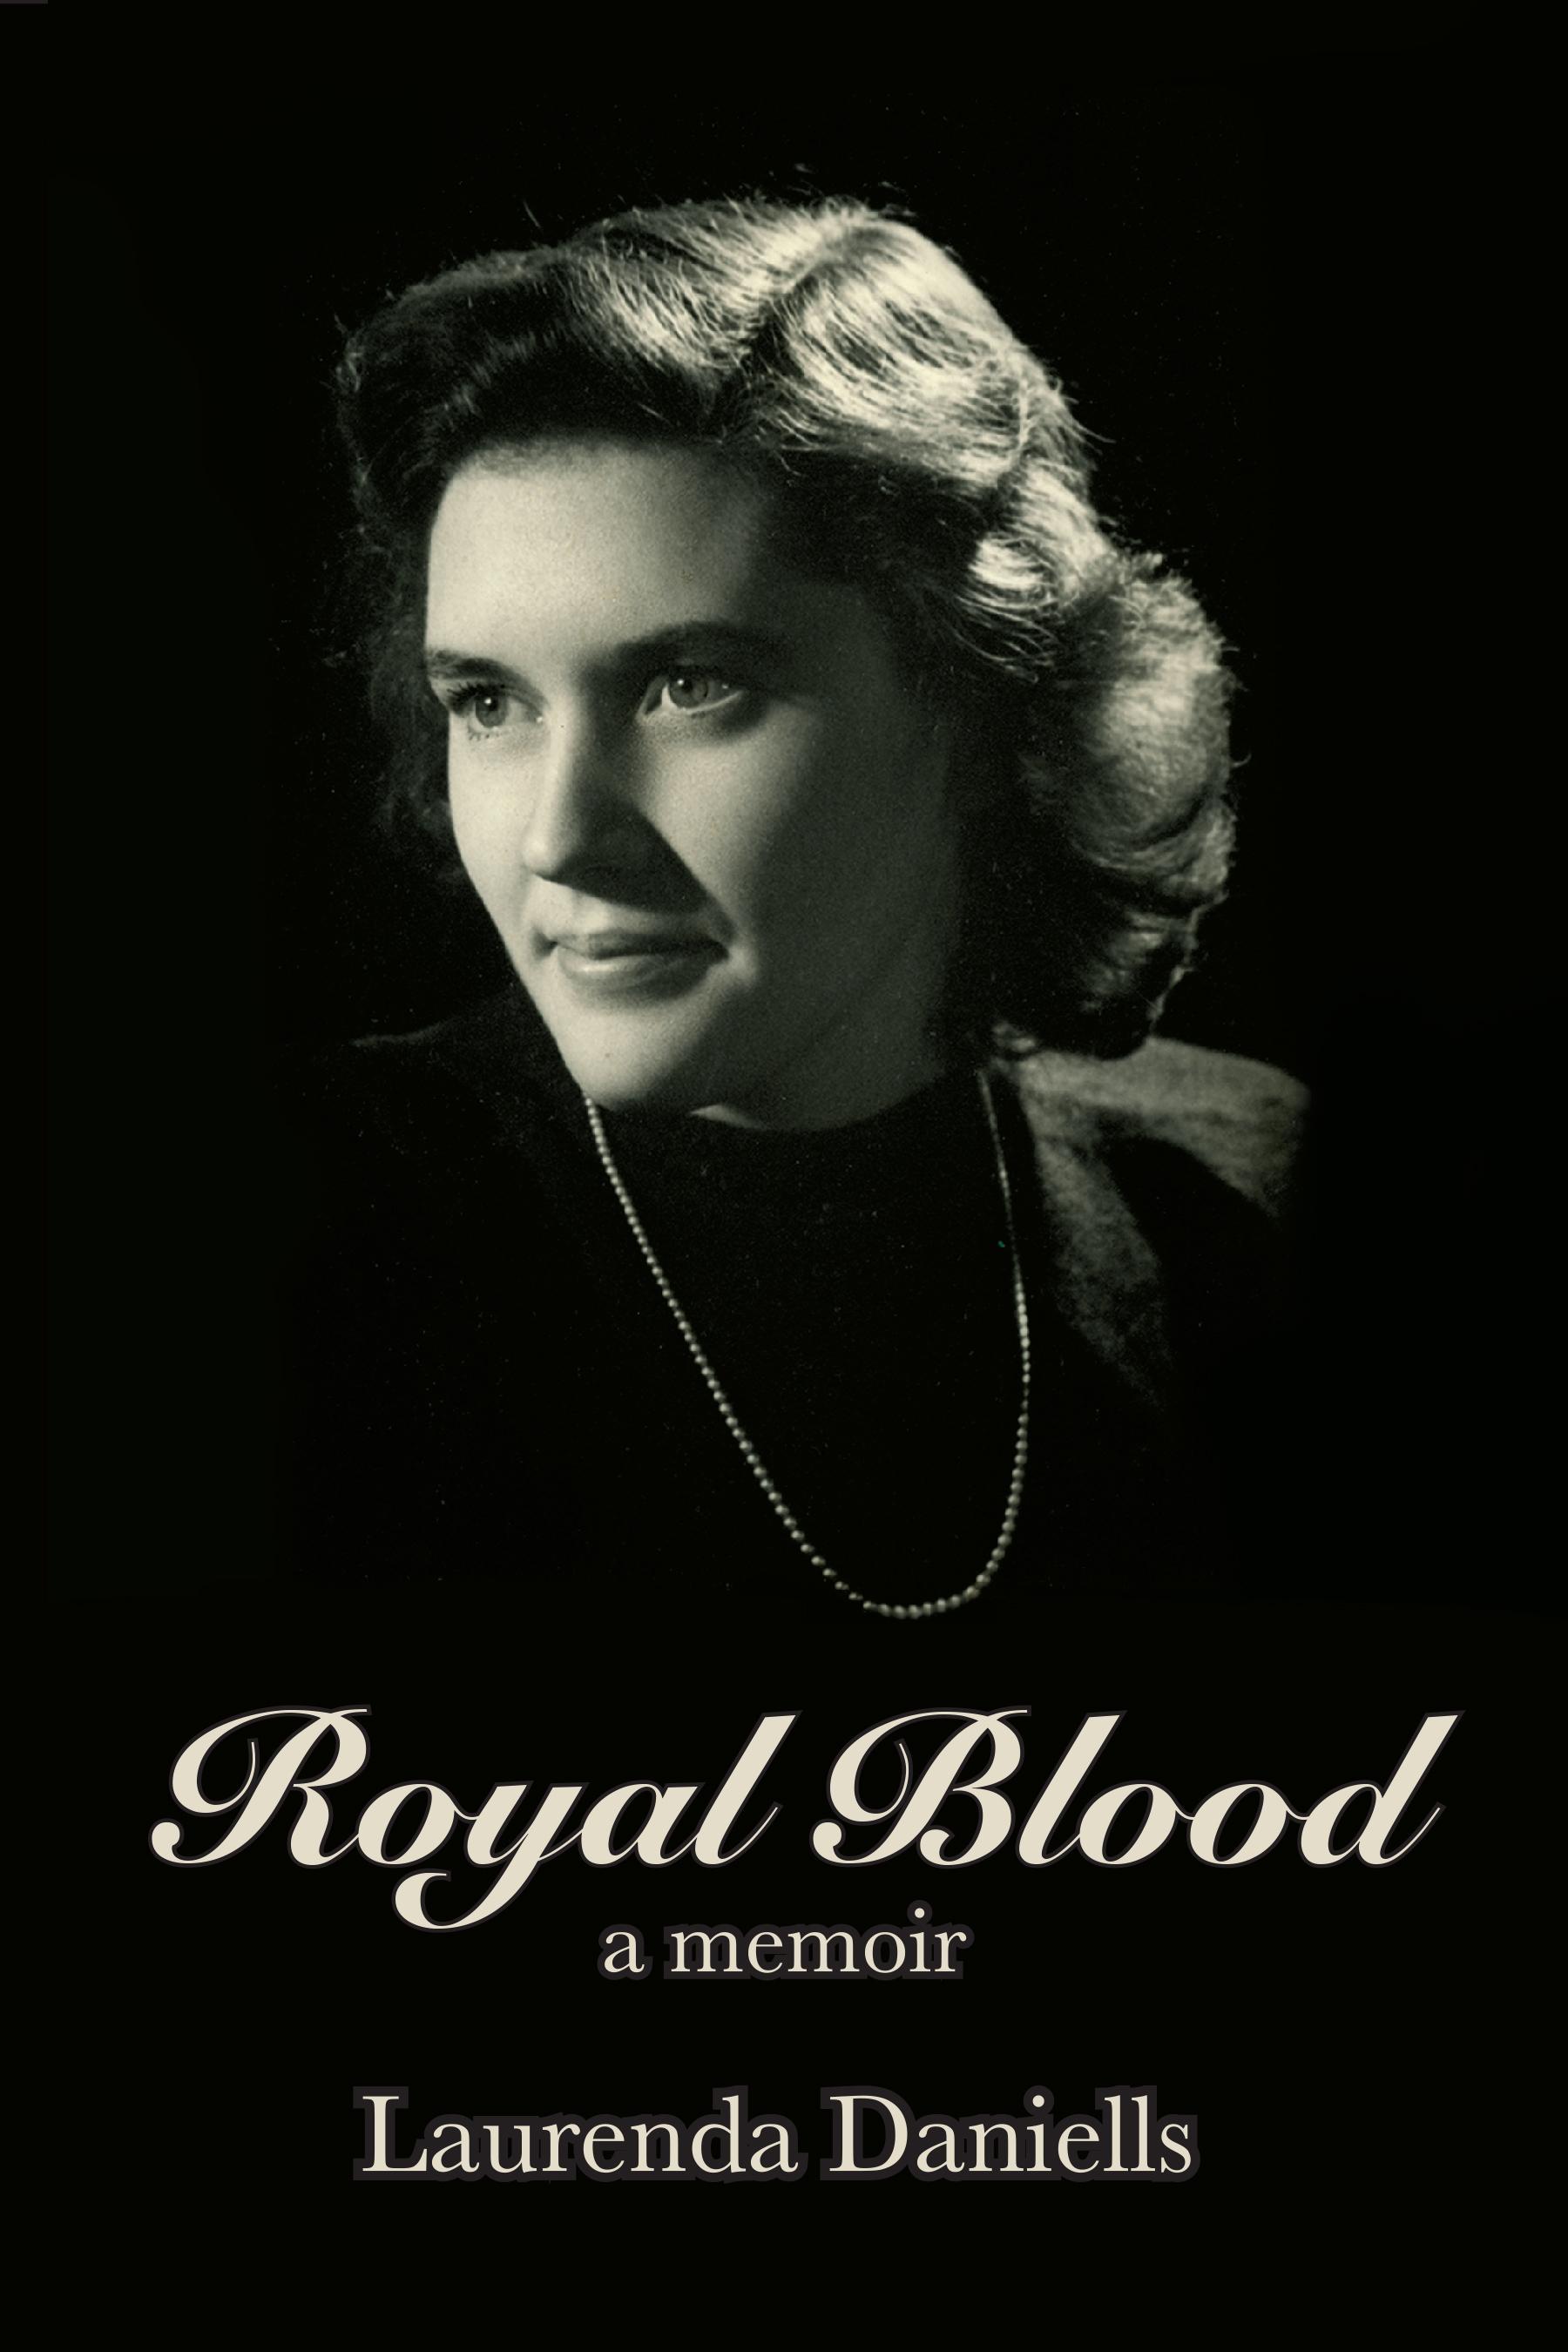 Royal Blood  by Laurenda Daniells, published June 2016